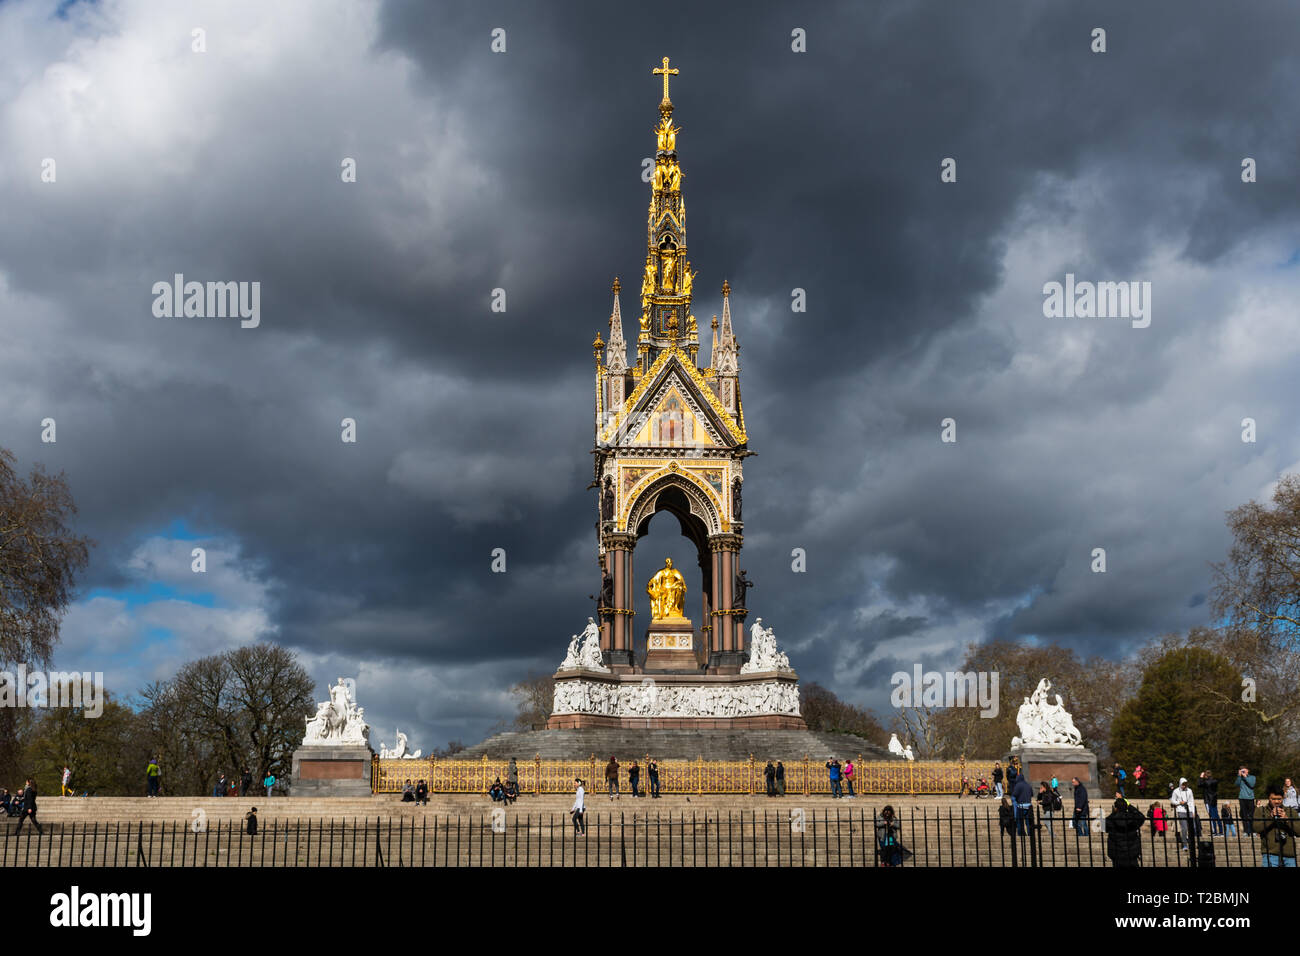 London monuments - Stock Image